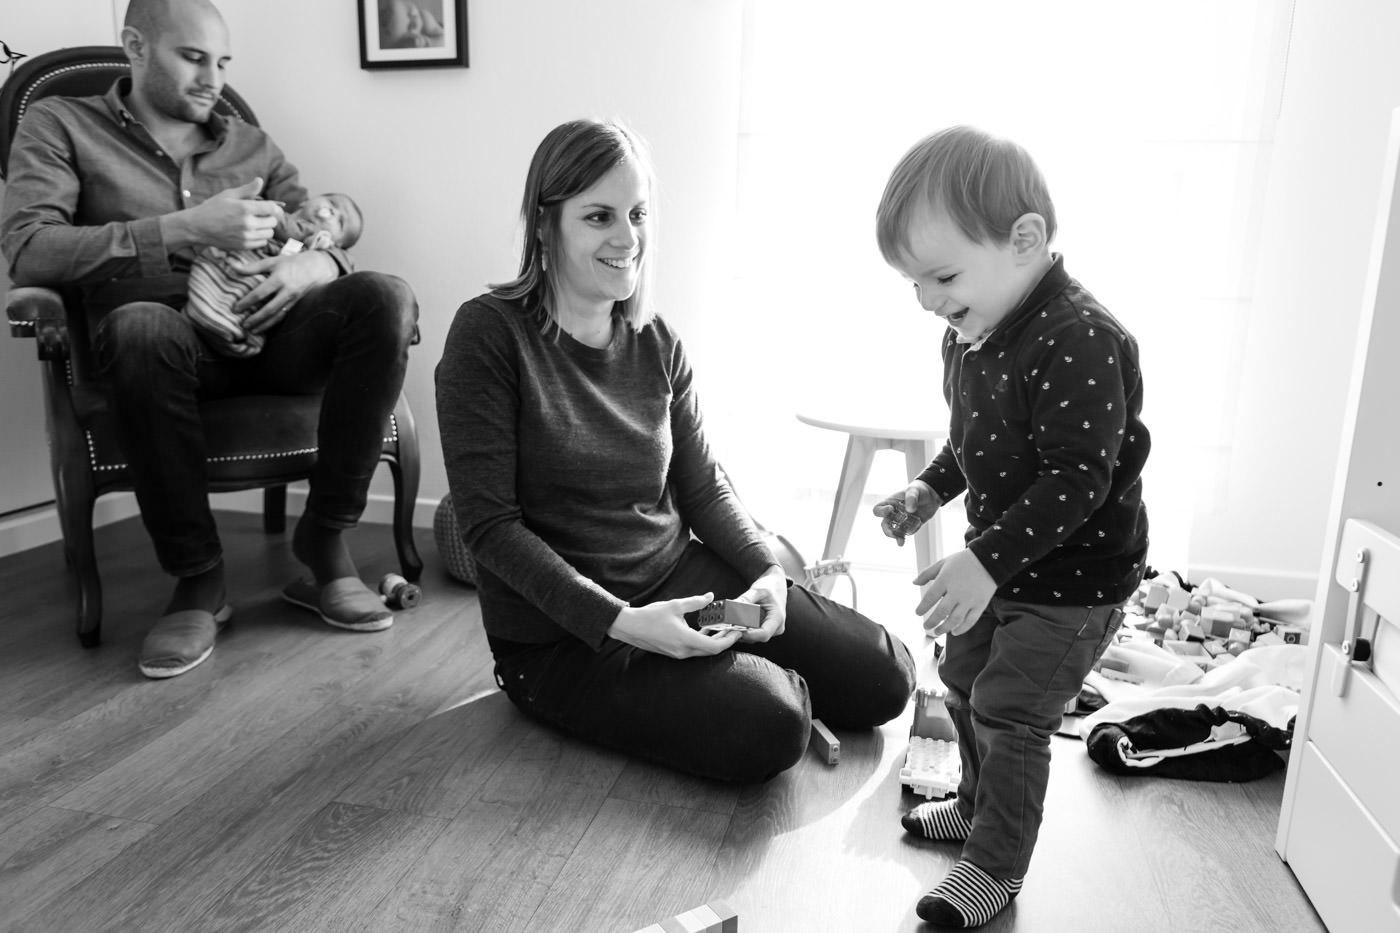 photographe metz famille domicile